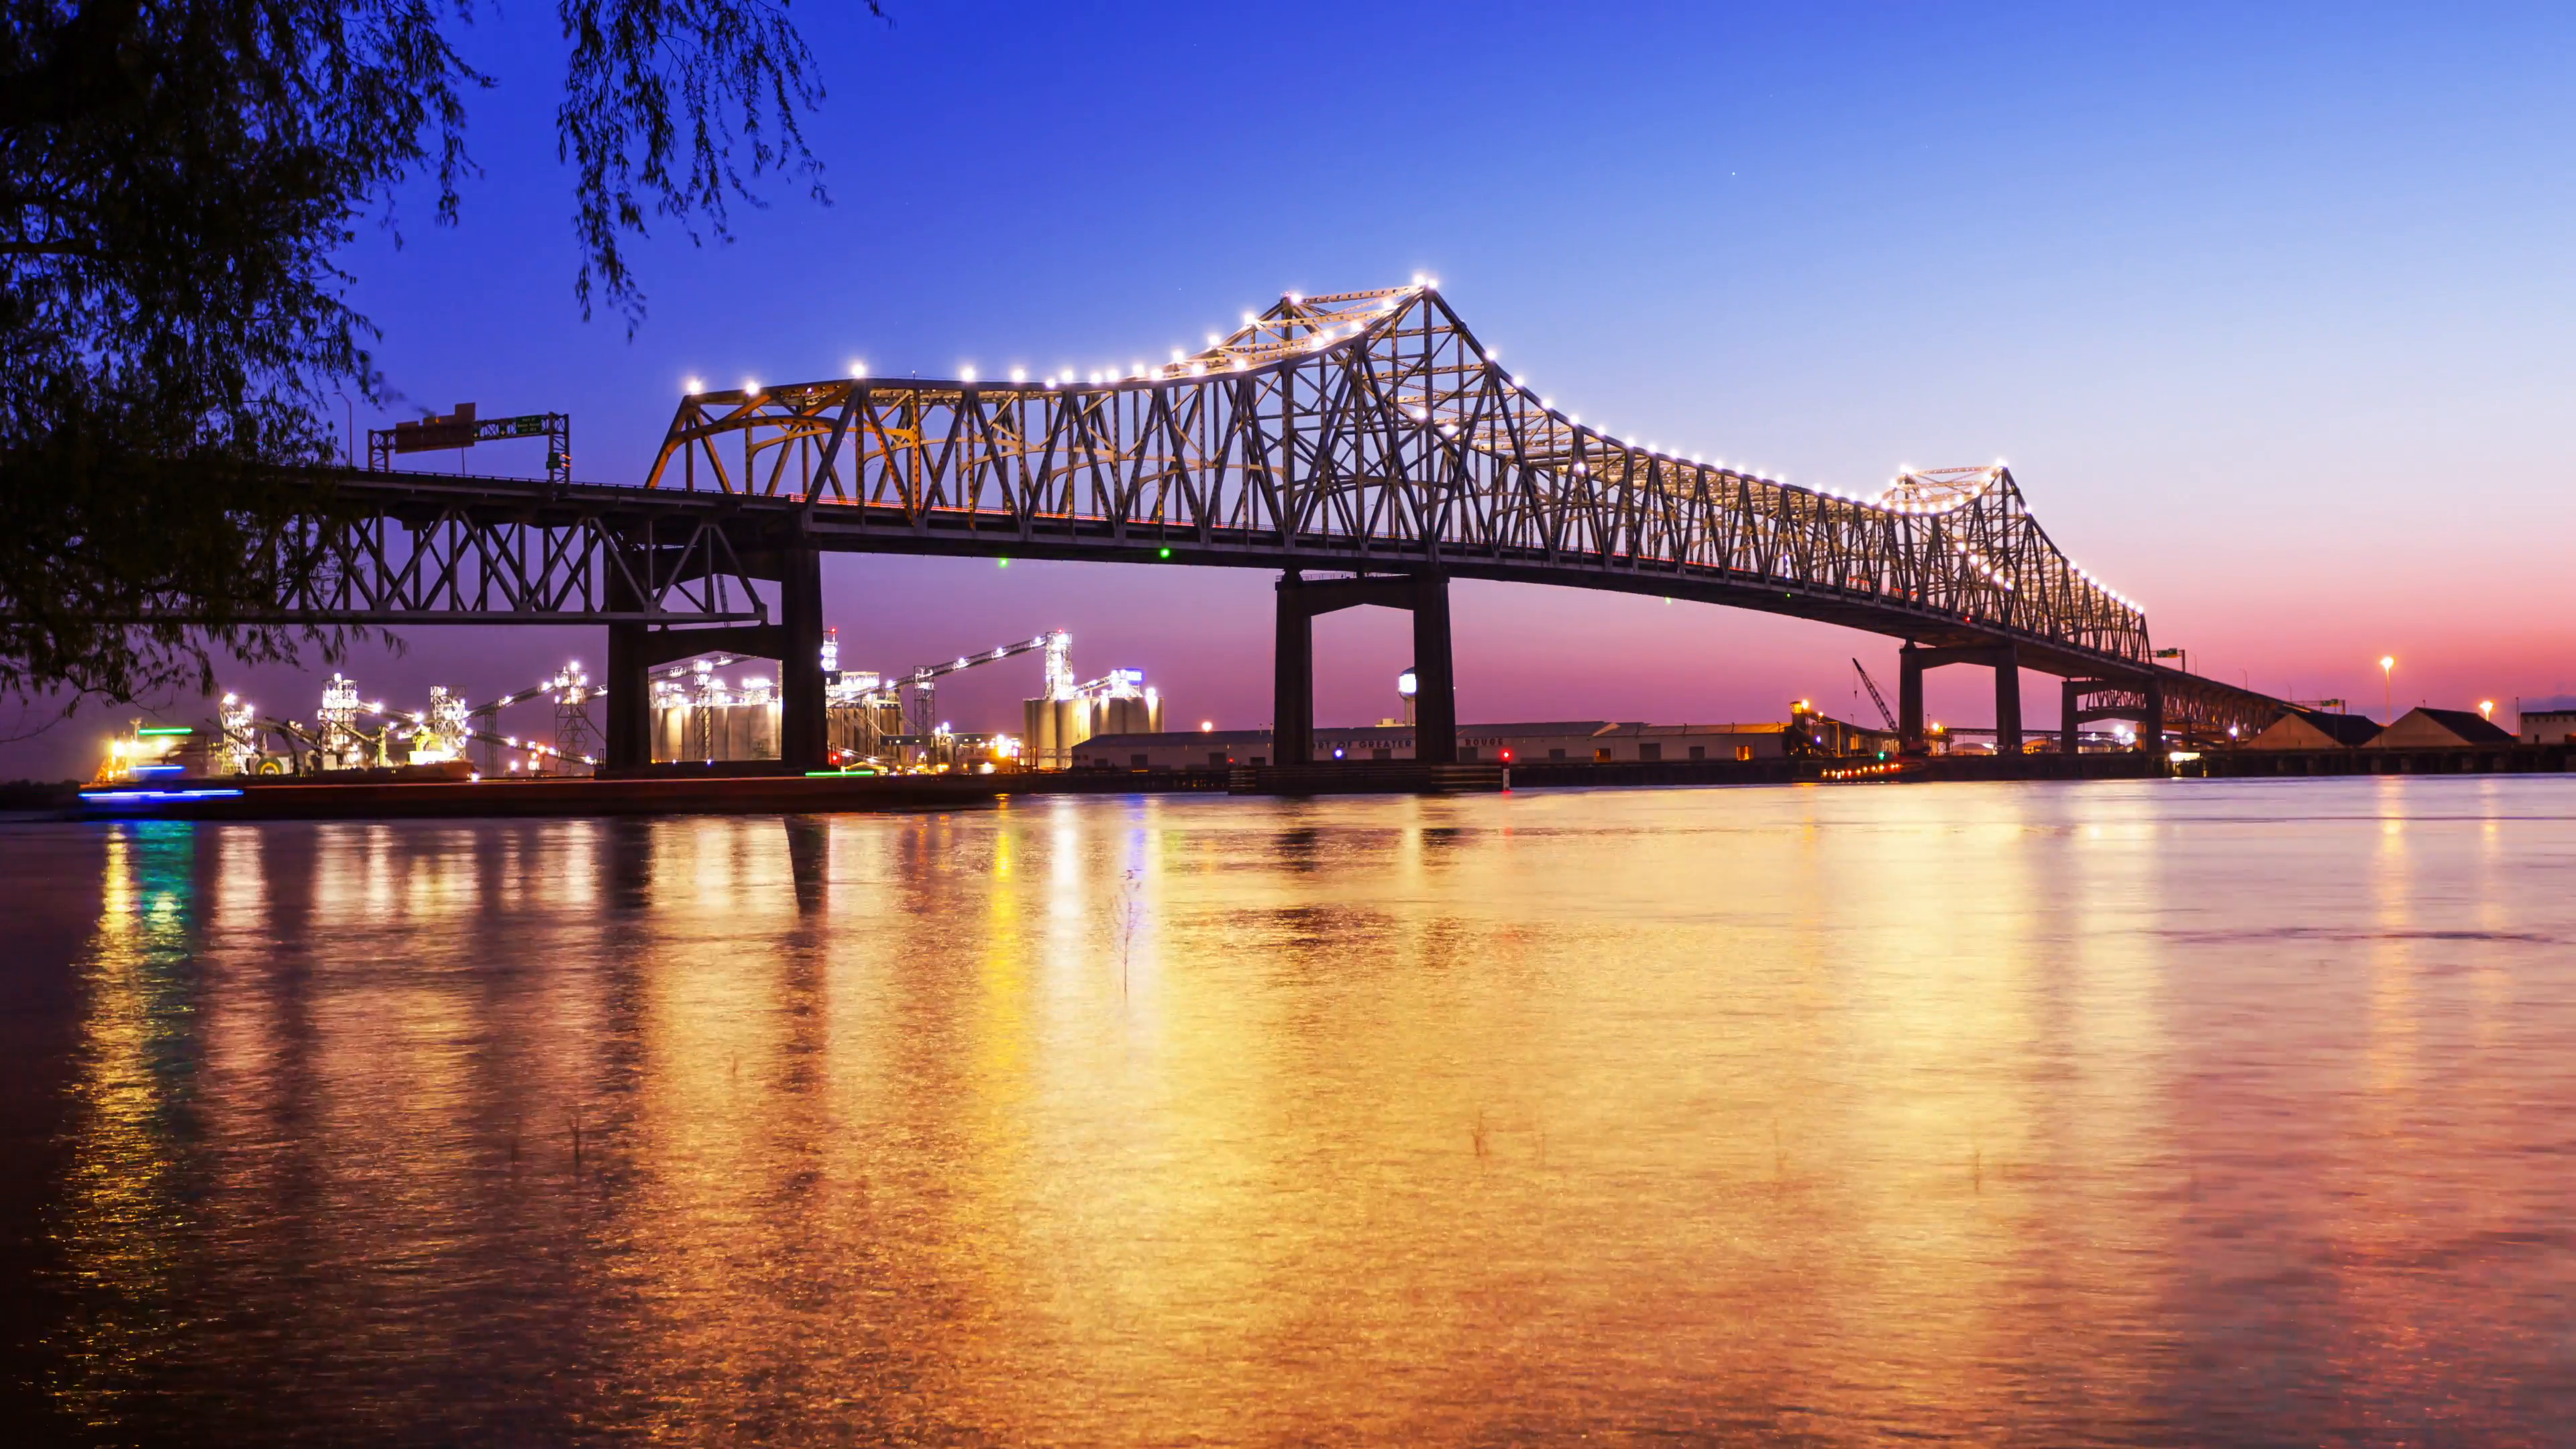 Bridge over night photo